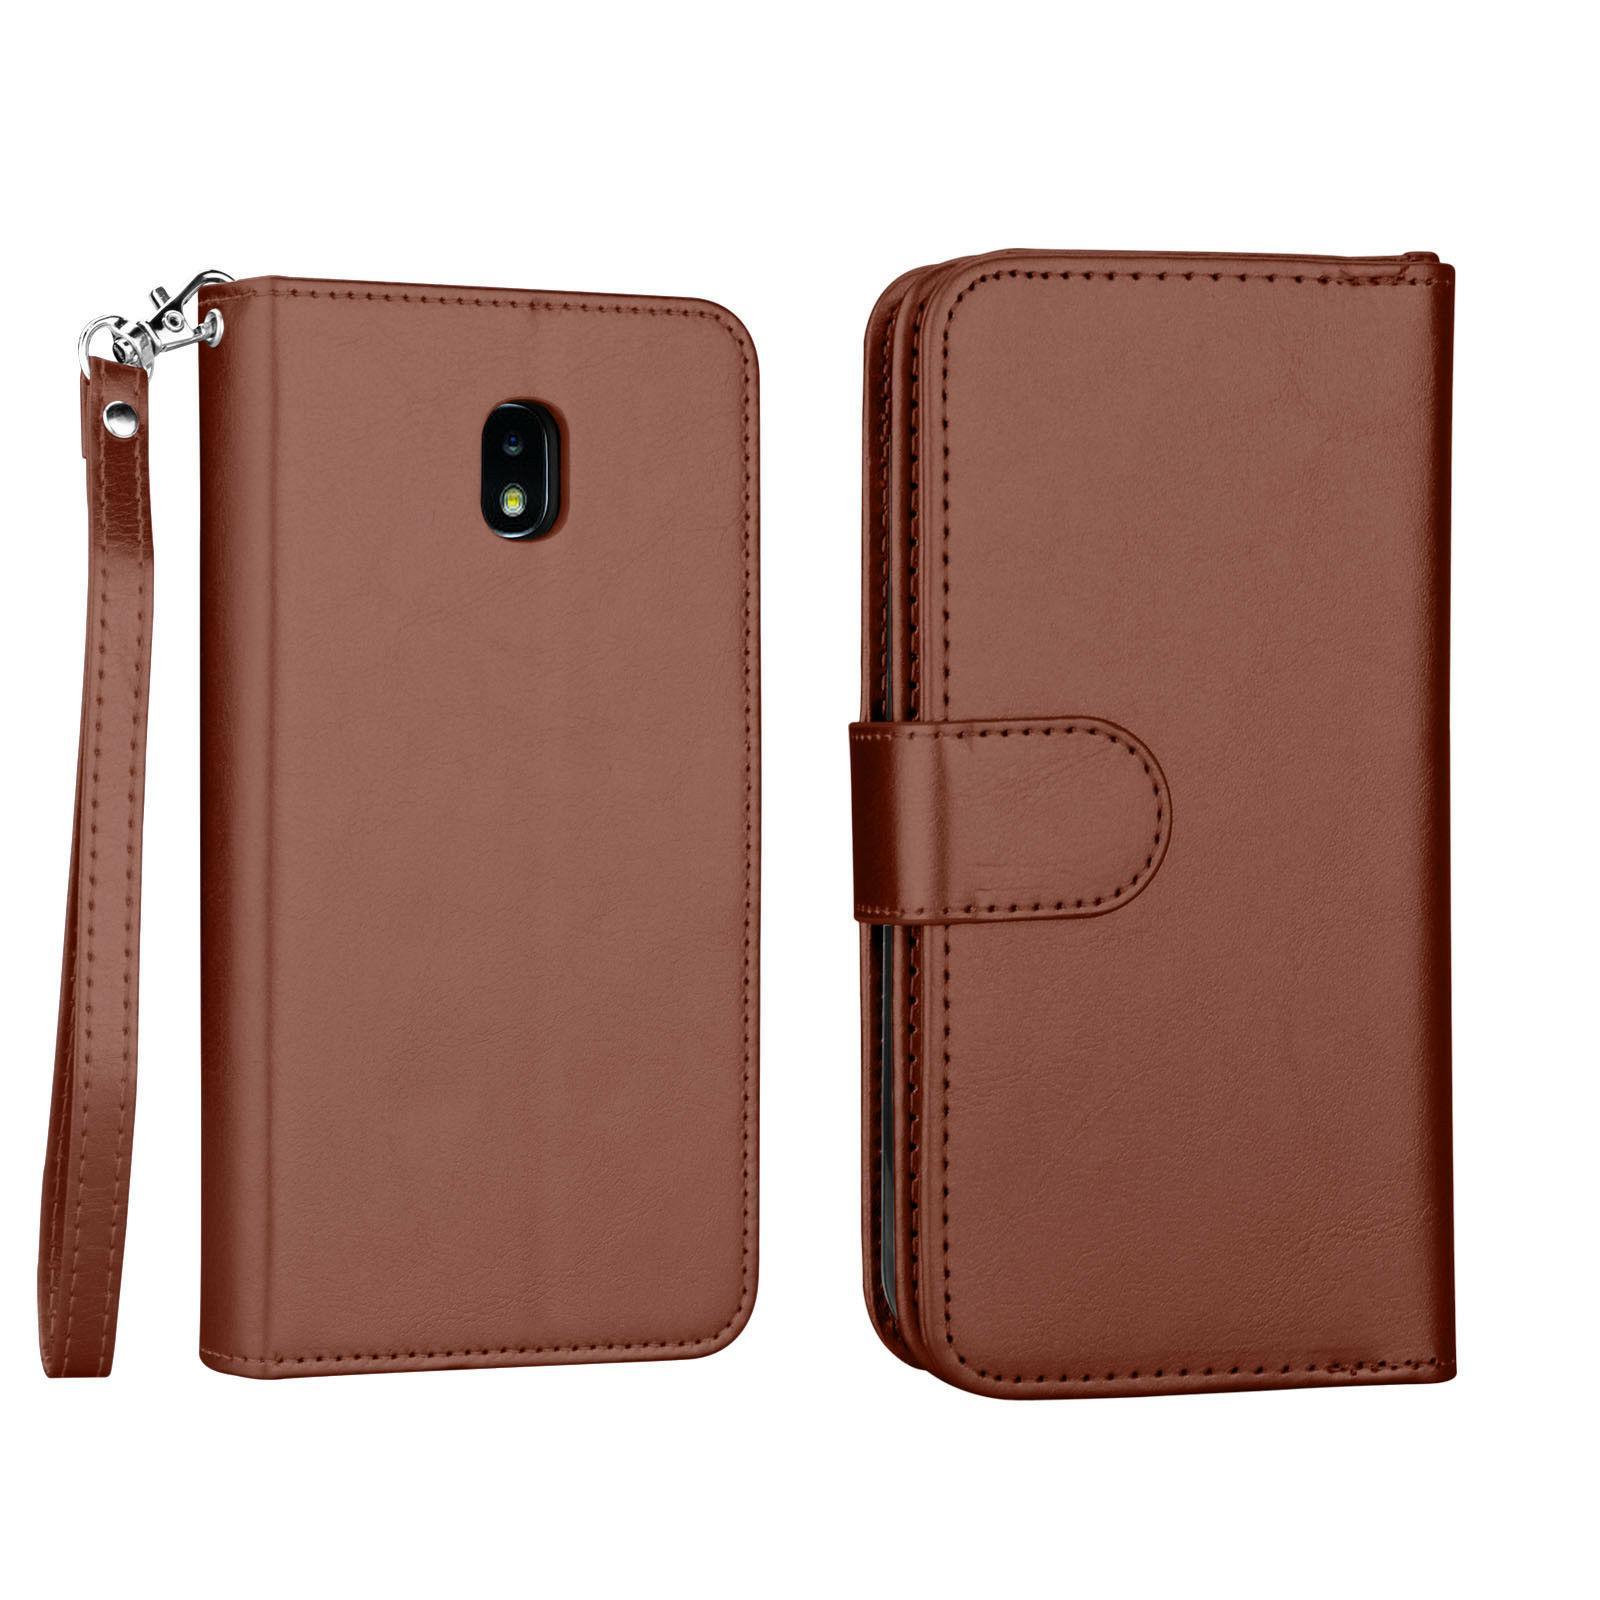 For J3 Star/Orbit /J3 V Flip Leather Wallet Phone